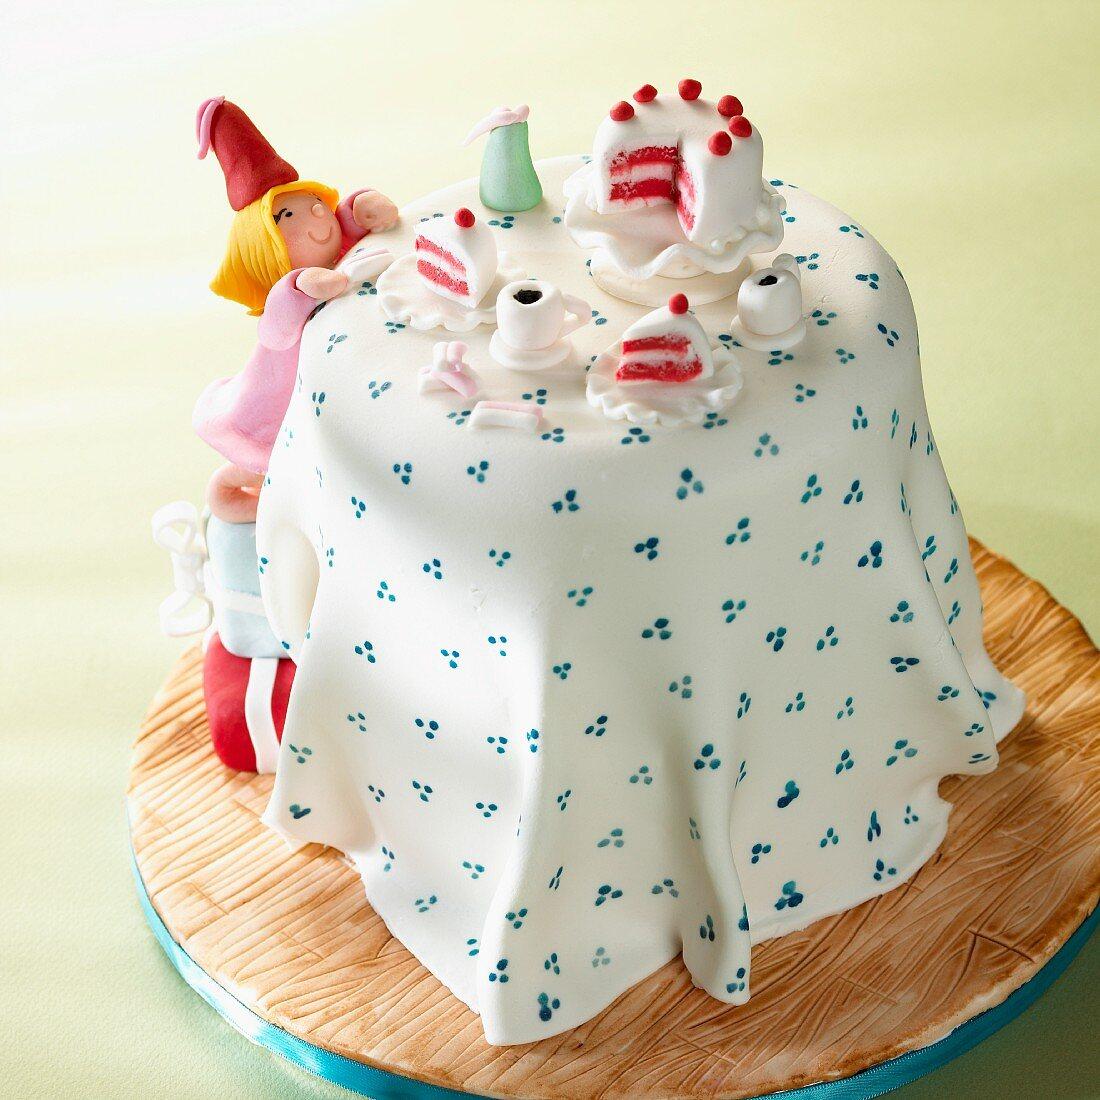 A marzipan cake